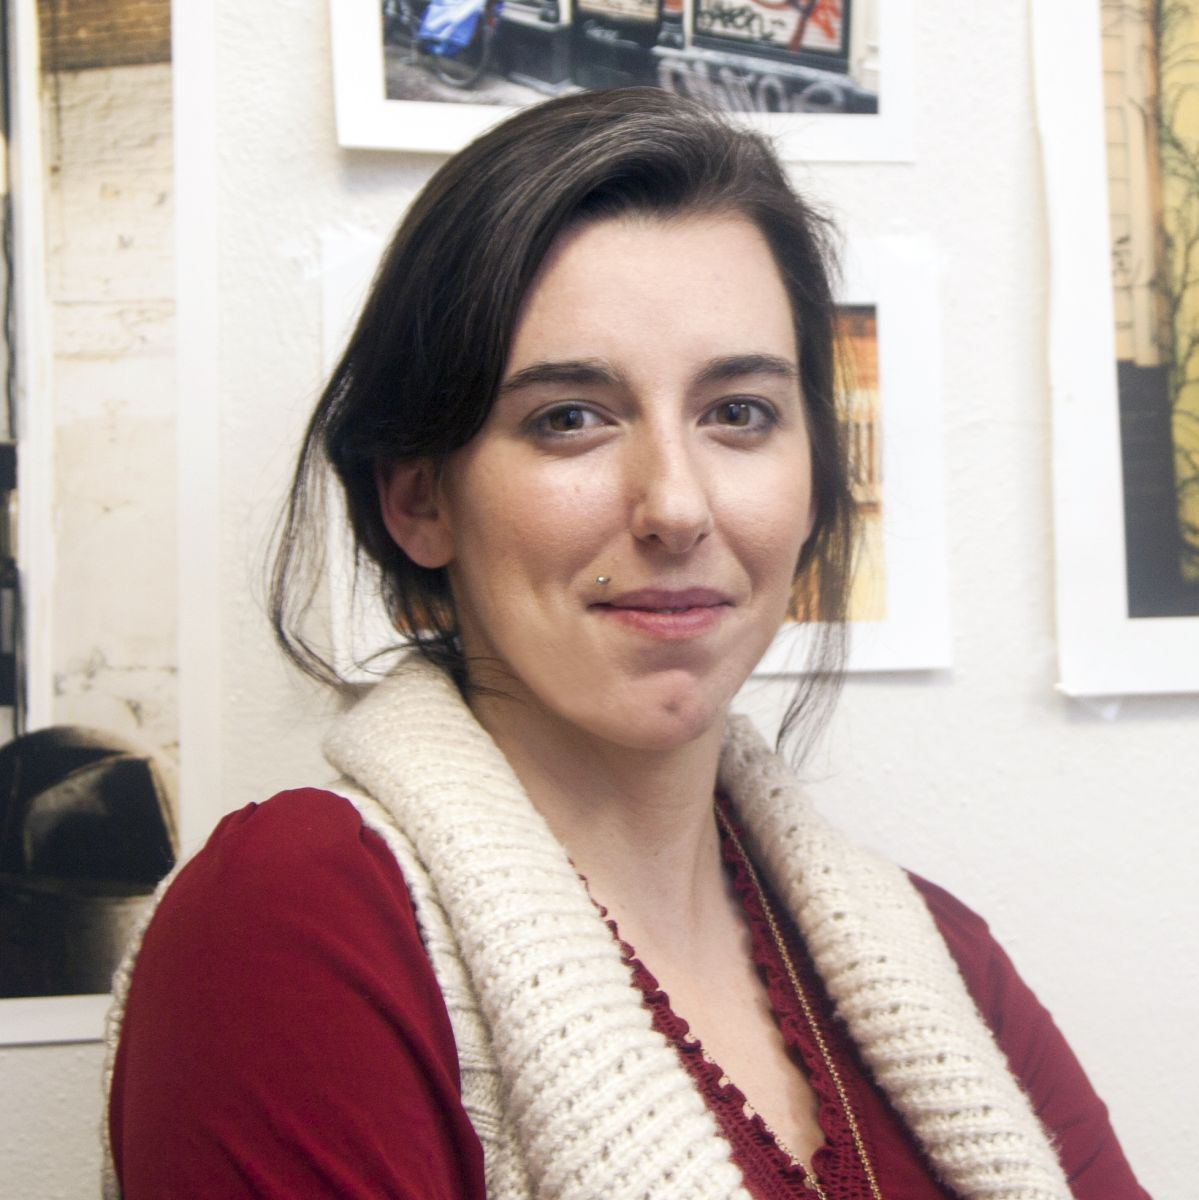 Portrait of Bridget Haina